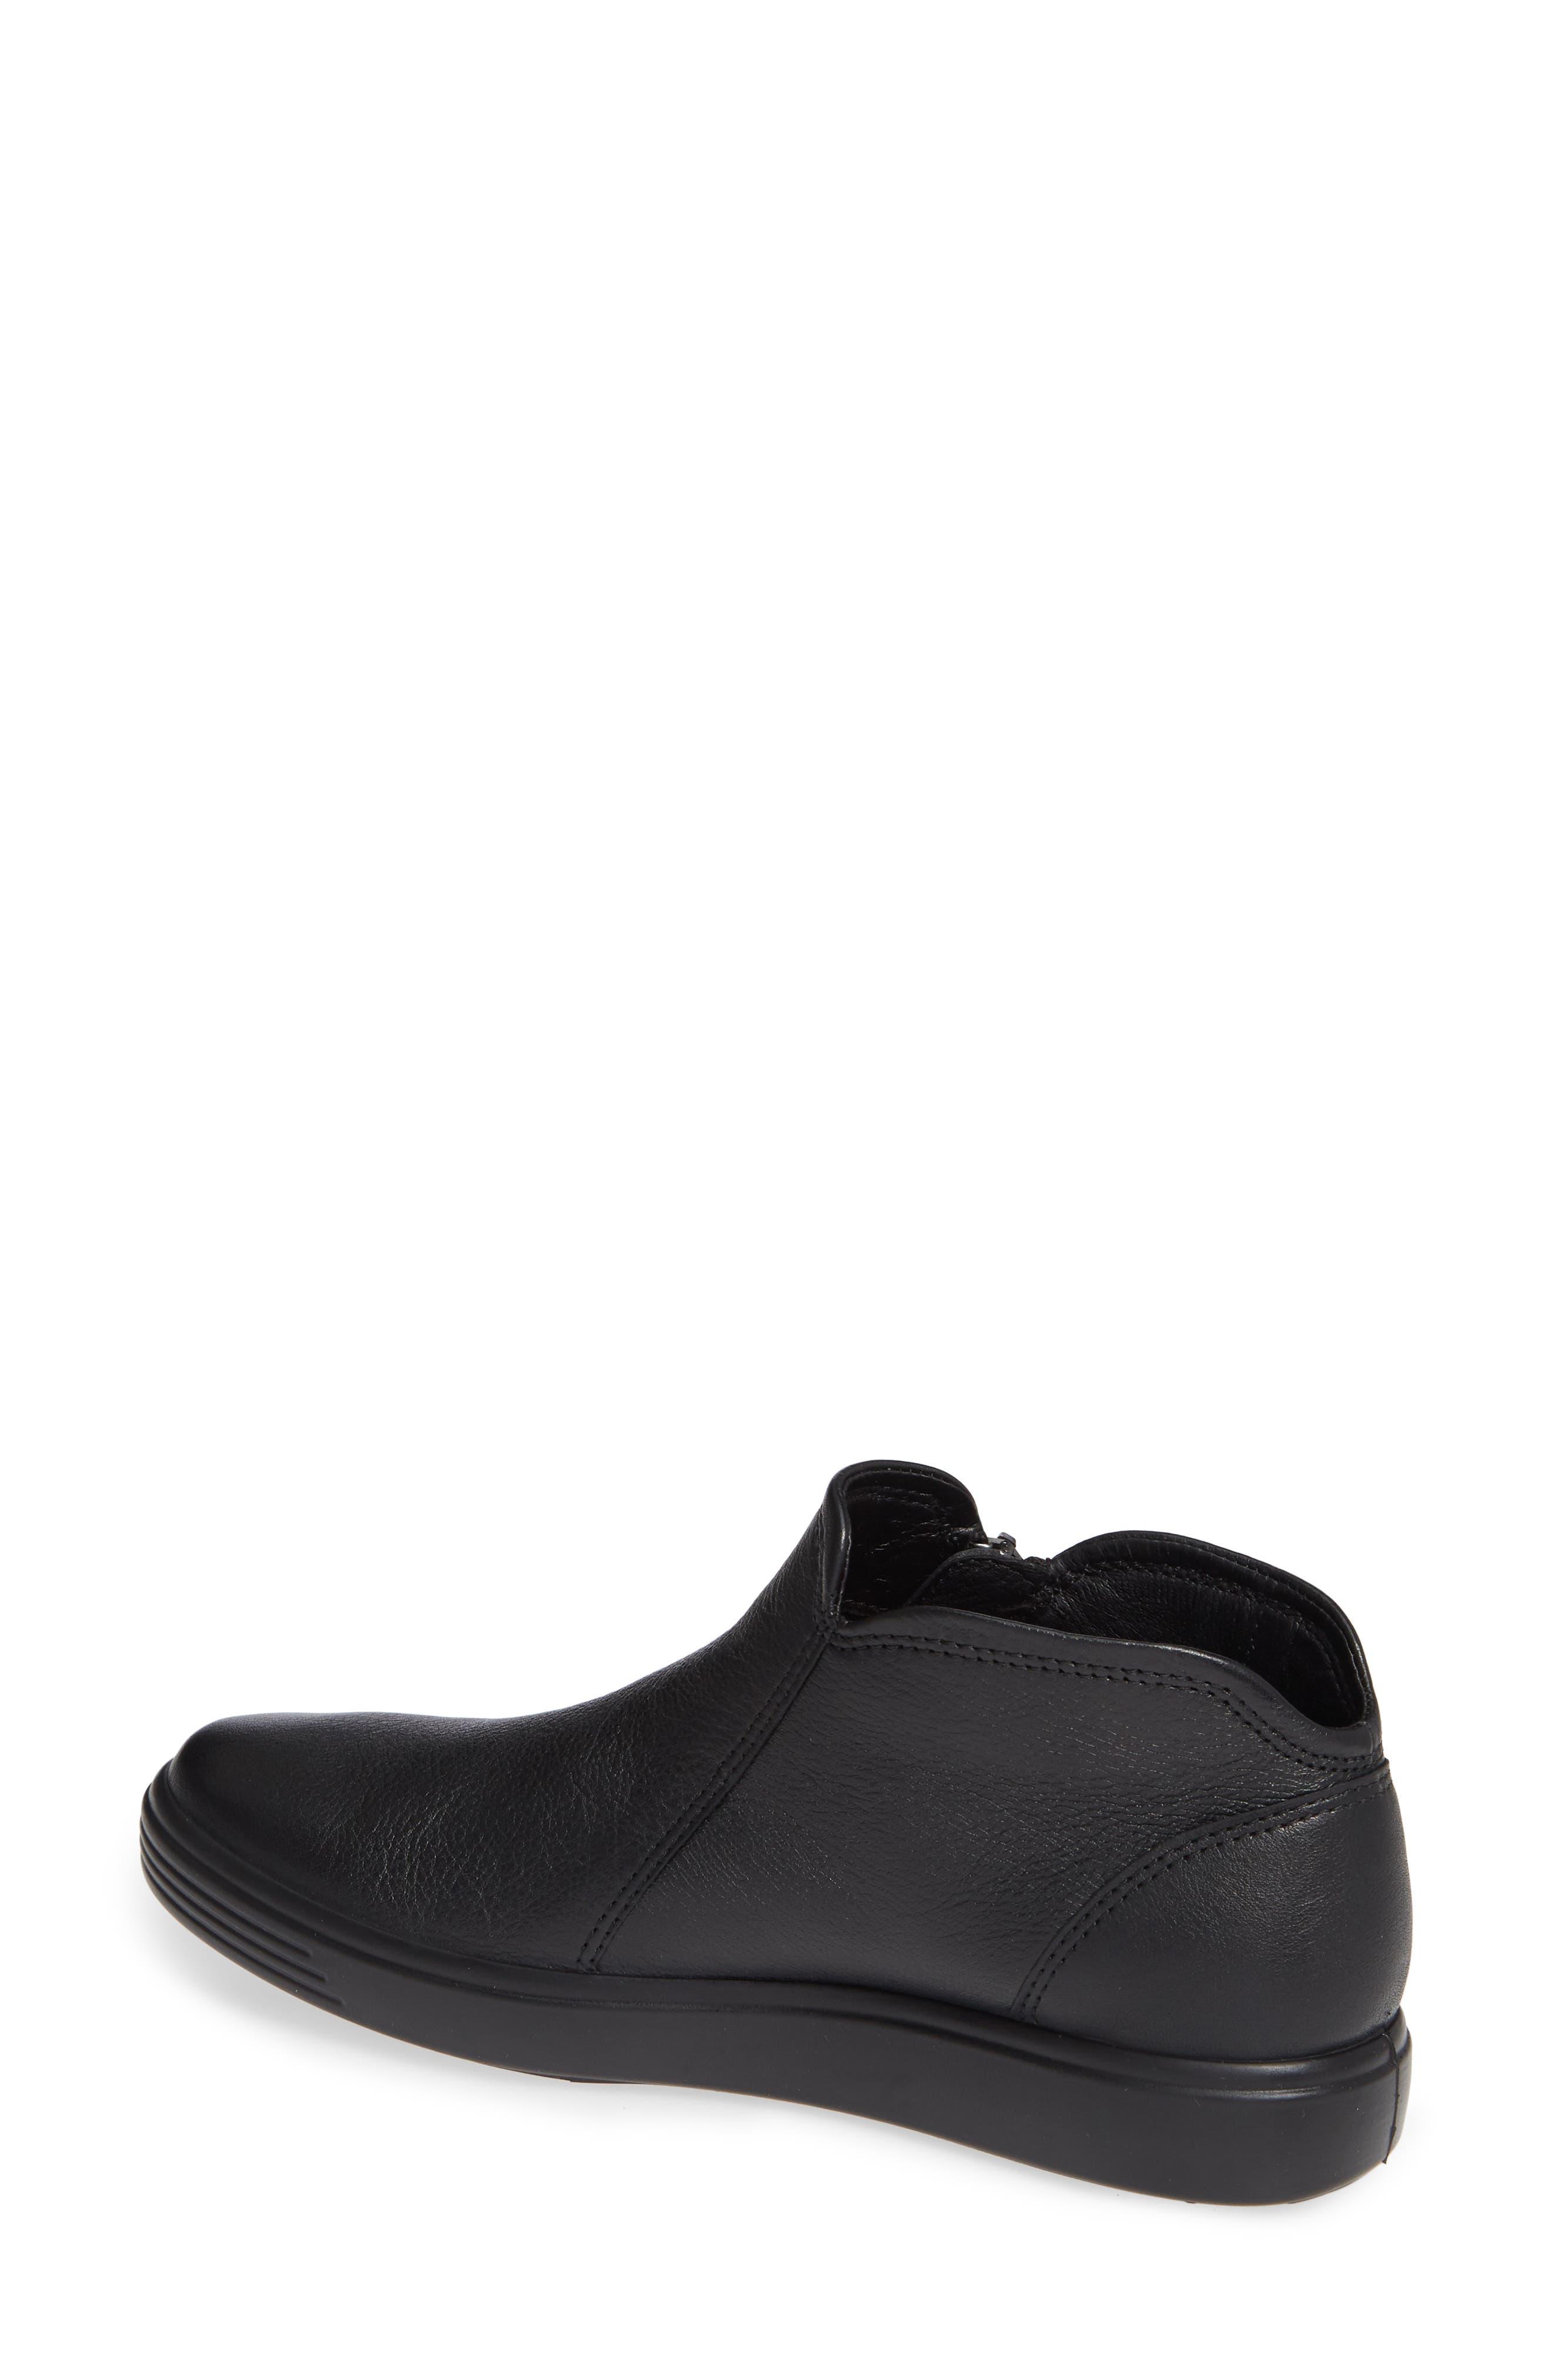 Soft 7 Mid Top Sneaker,                             Alternate thumbnail 2, color,                             BLACK/ BLACK LEATHER